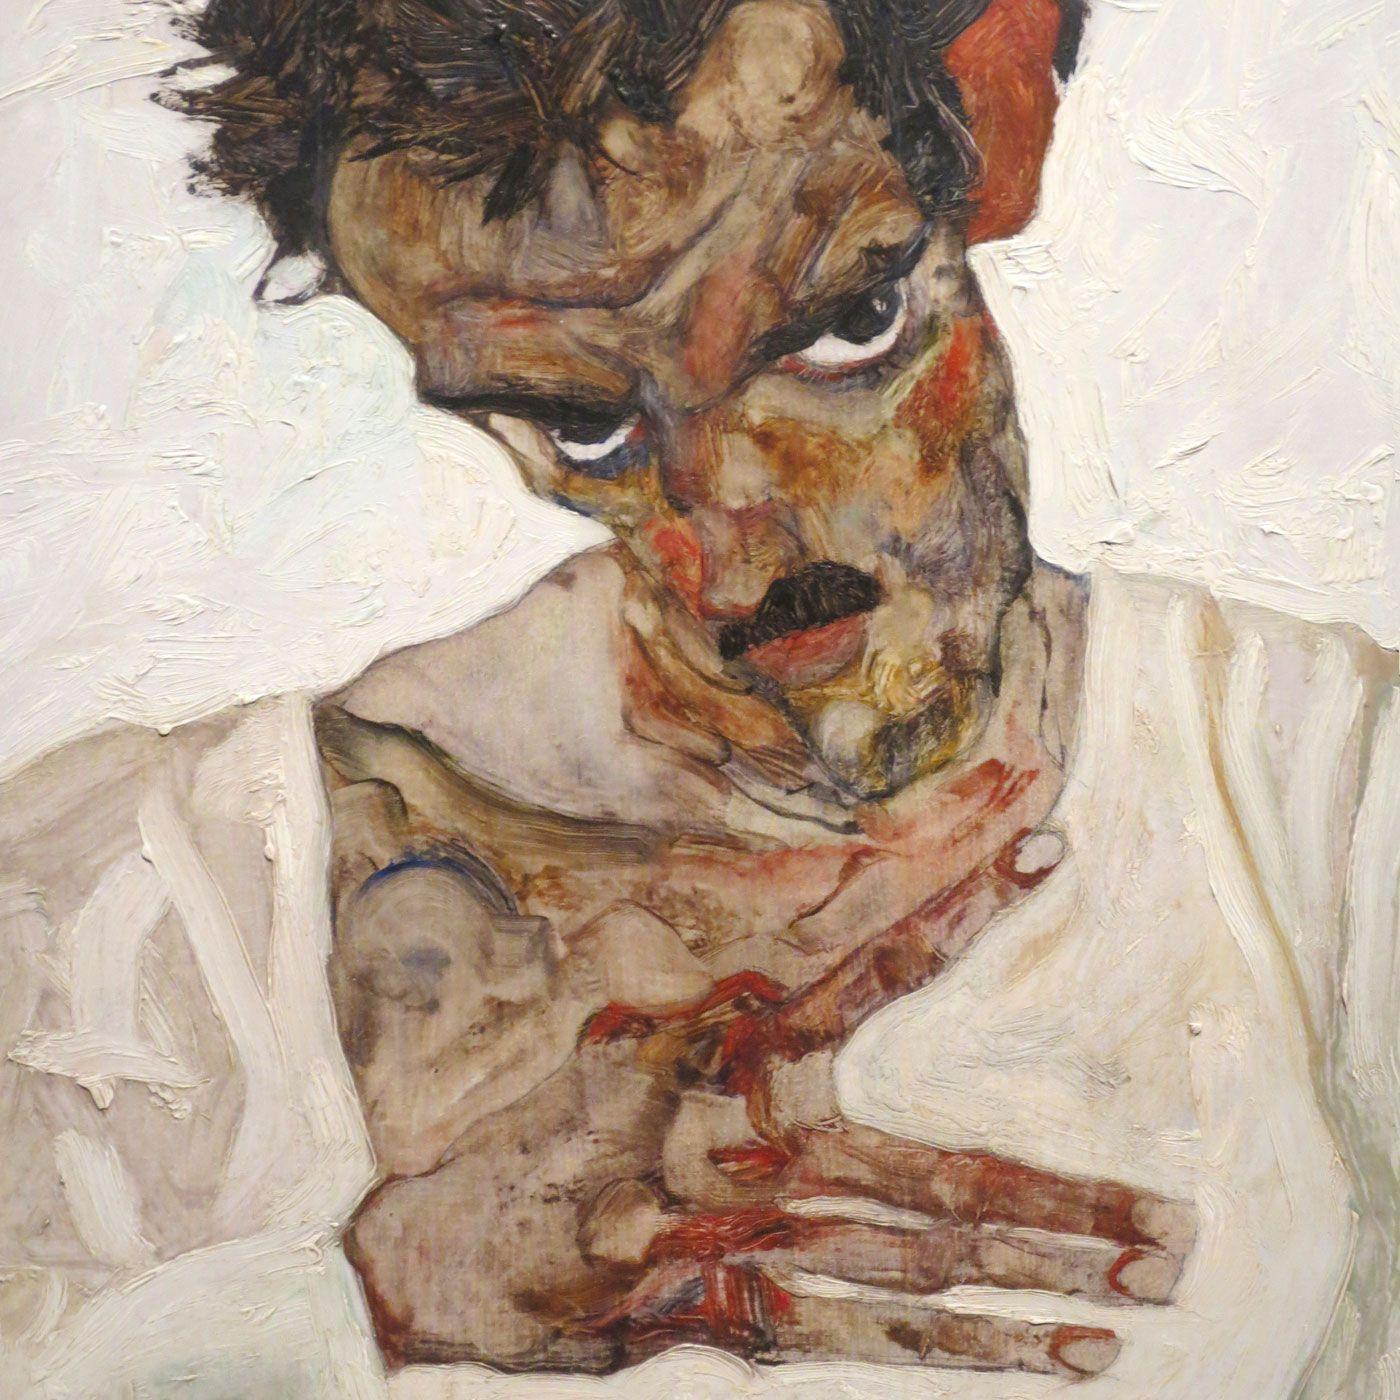 1400x1400 Egon Schiele - Freedom of the Ego - Thomas Michel